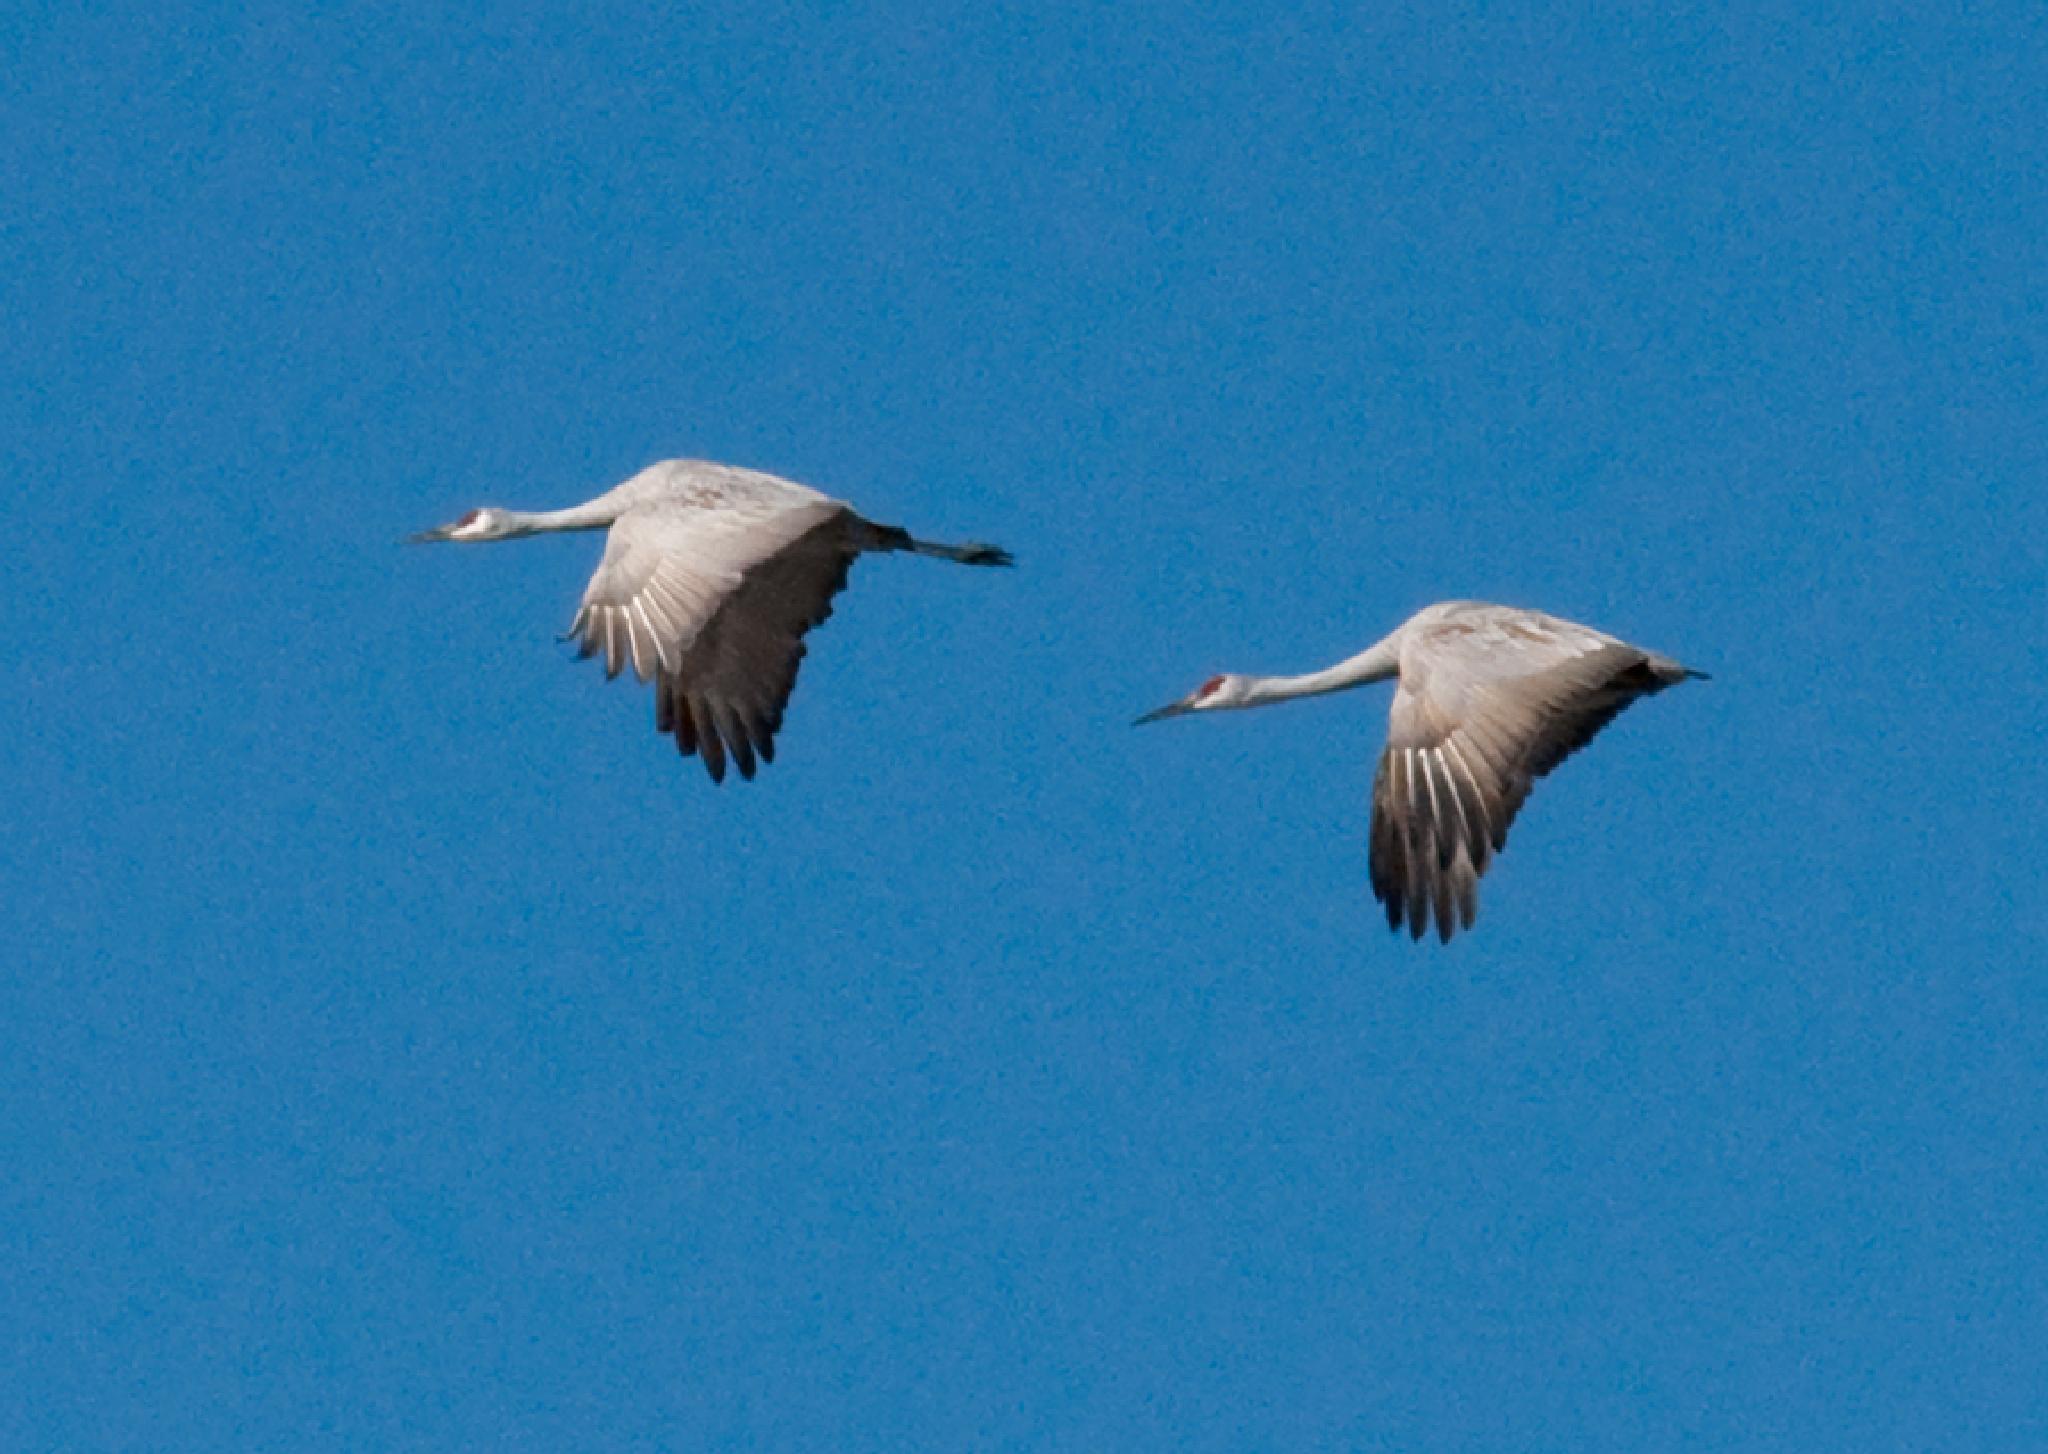 Sandhill Cranes in flight by debra.louden1